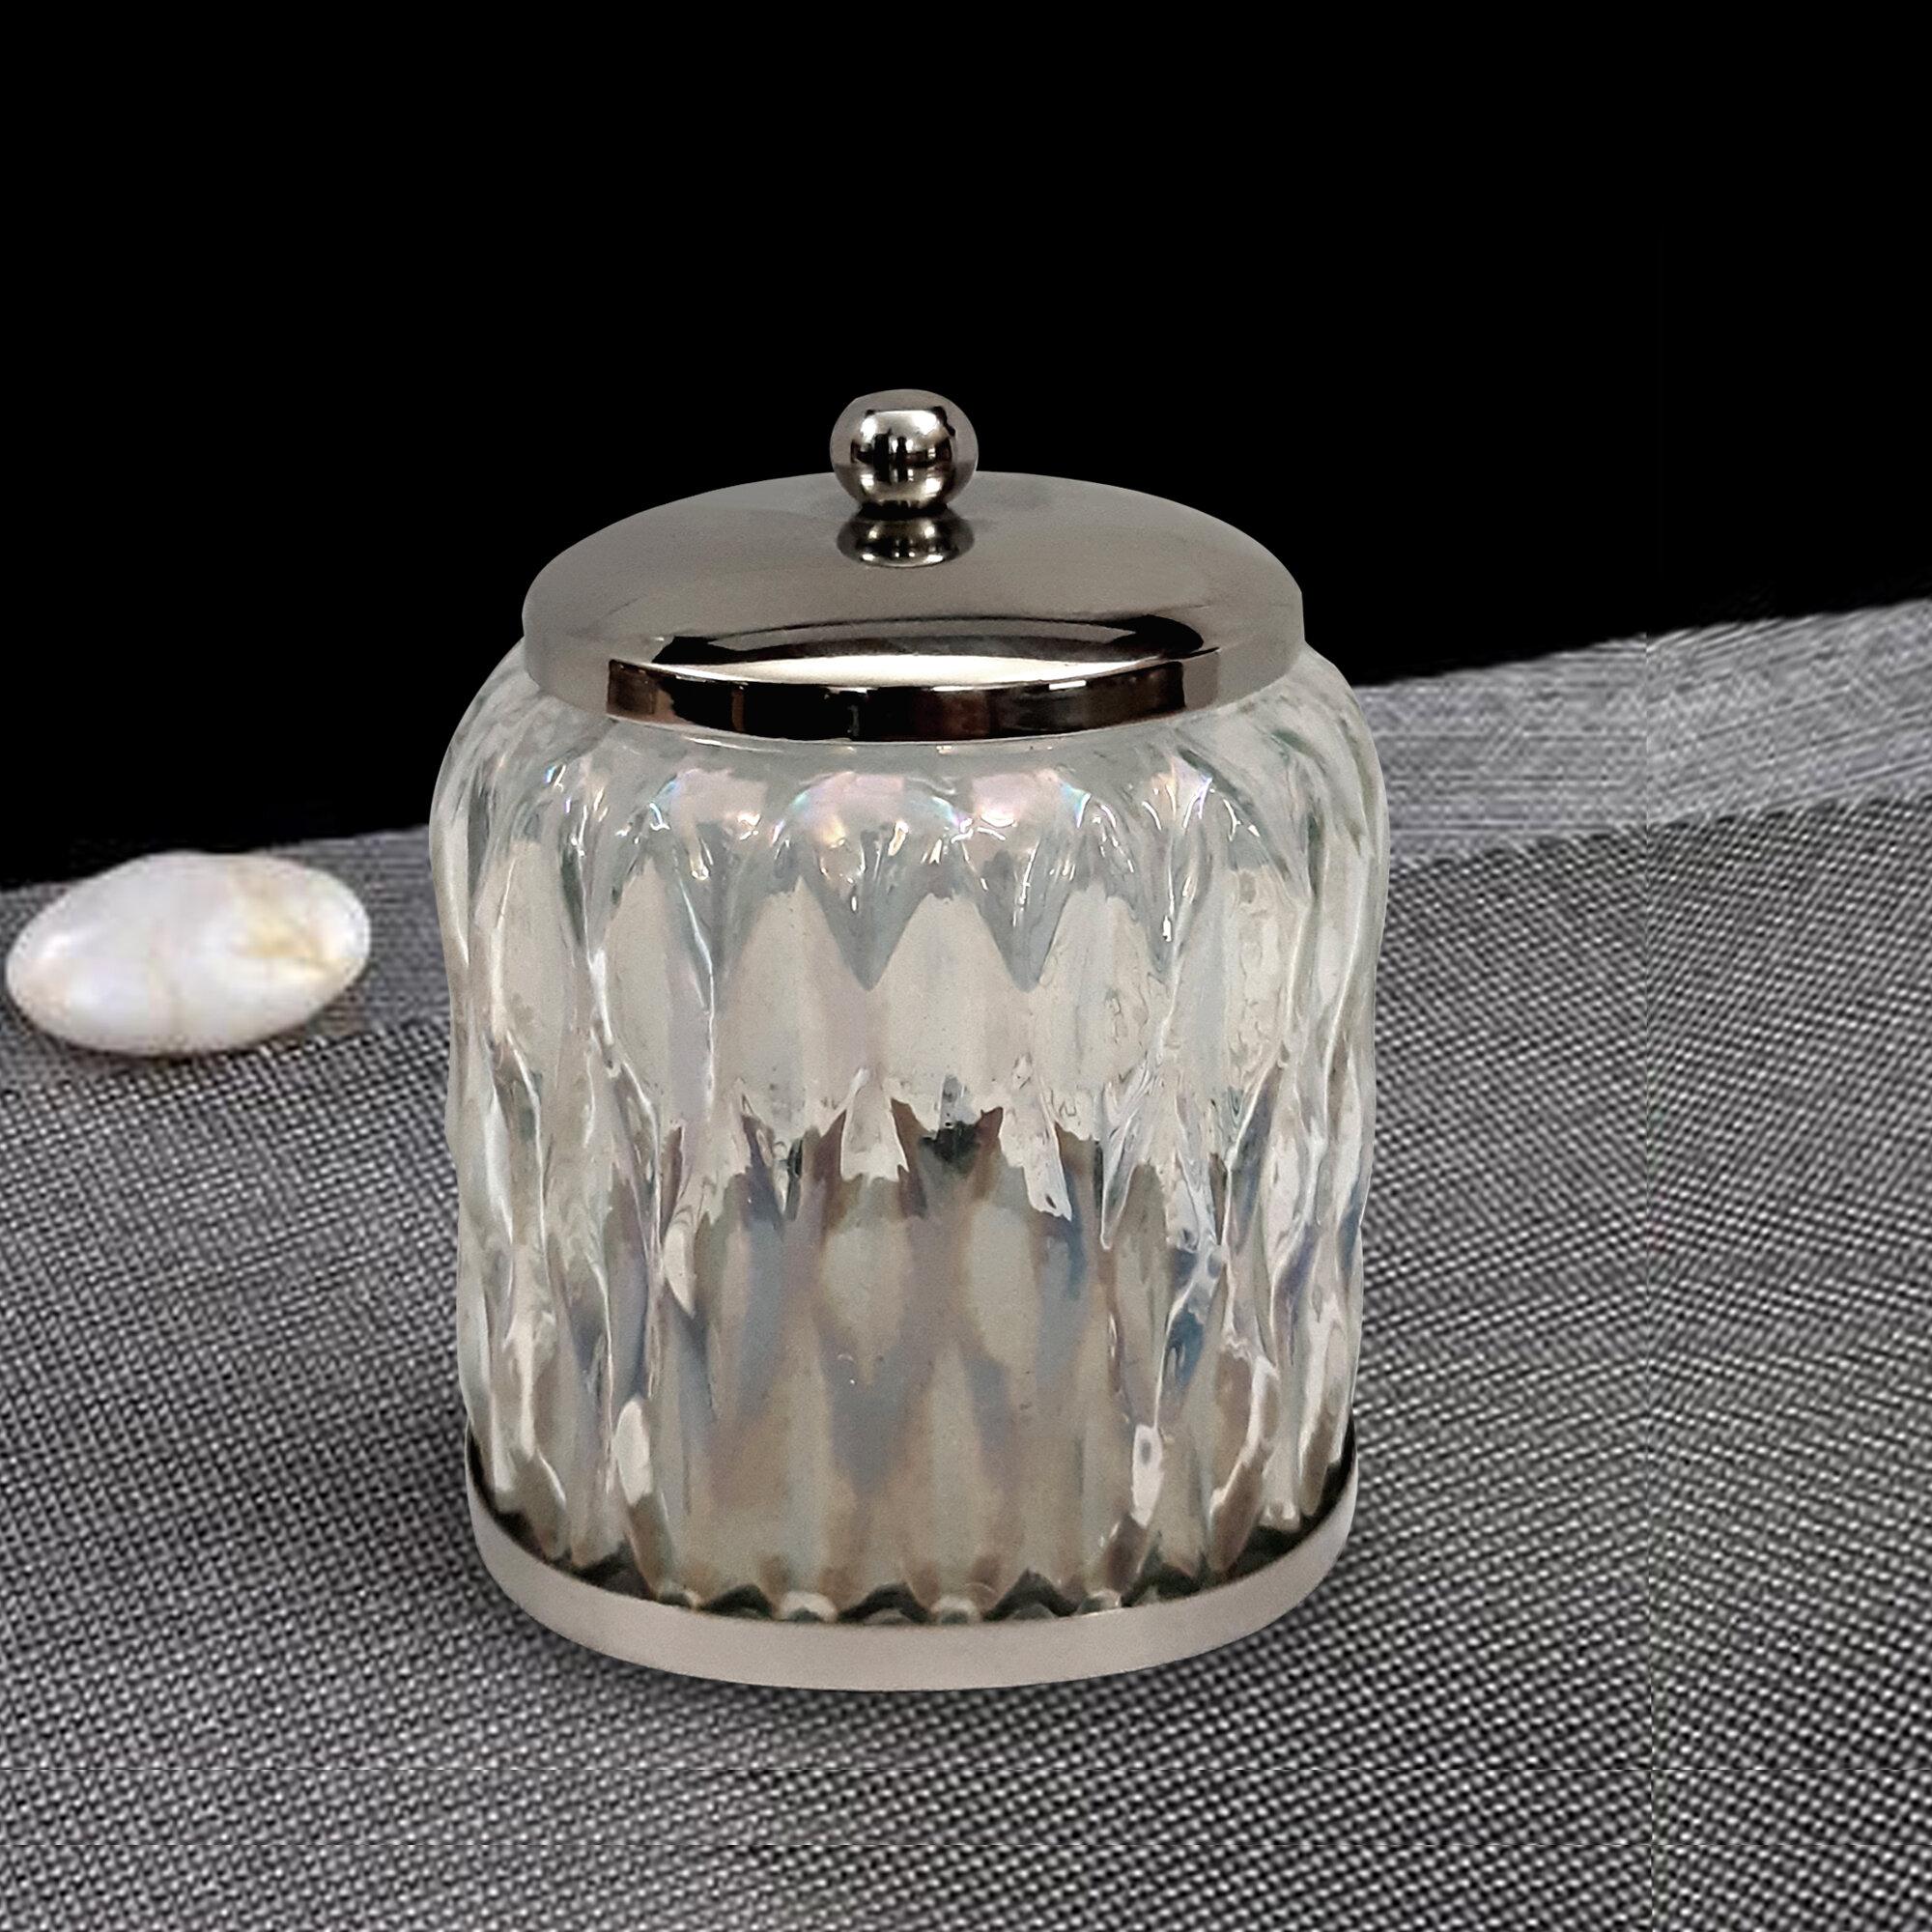 Canora Grey Savoie Rainbow Cotton Swab Bathroom Vanity Glass Storage Jar Reviews Wayfair